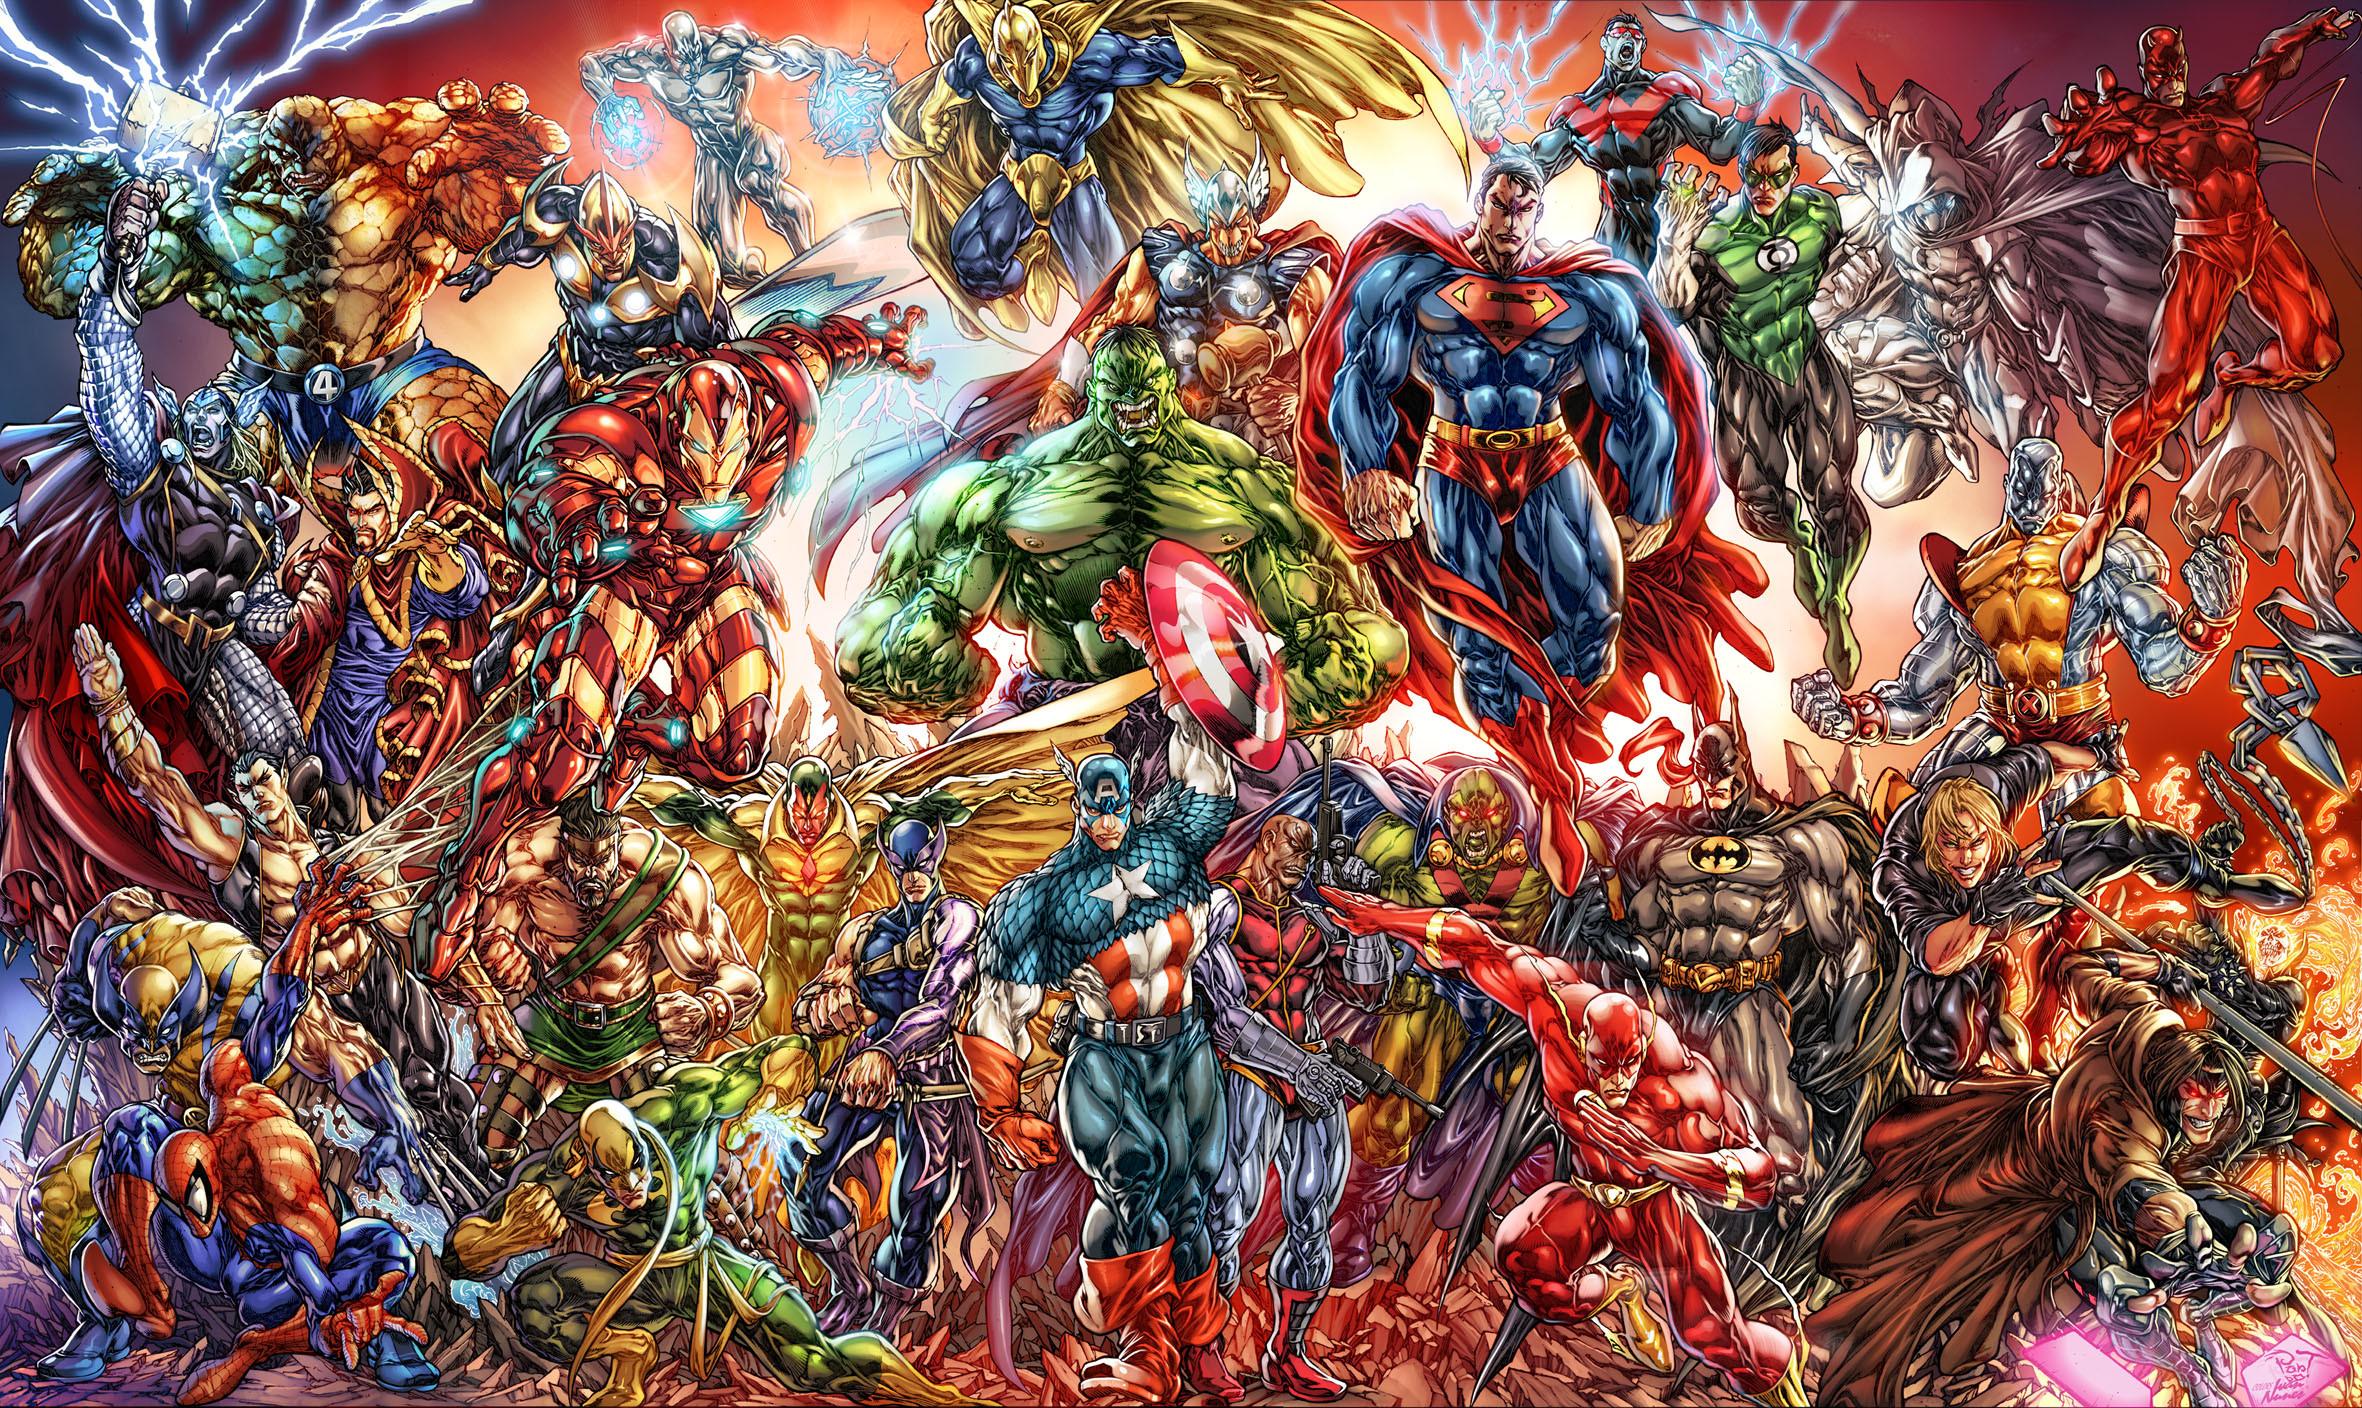 Marvel superheroes wallpaper 62 images 1920x1080 marvel superheroes 835981 download 1920x1080 amazingspidermanactionadventurefantasymoviemarvel wallpaper voltagebd Images